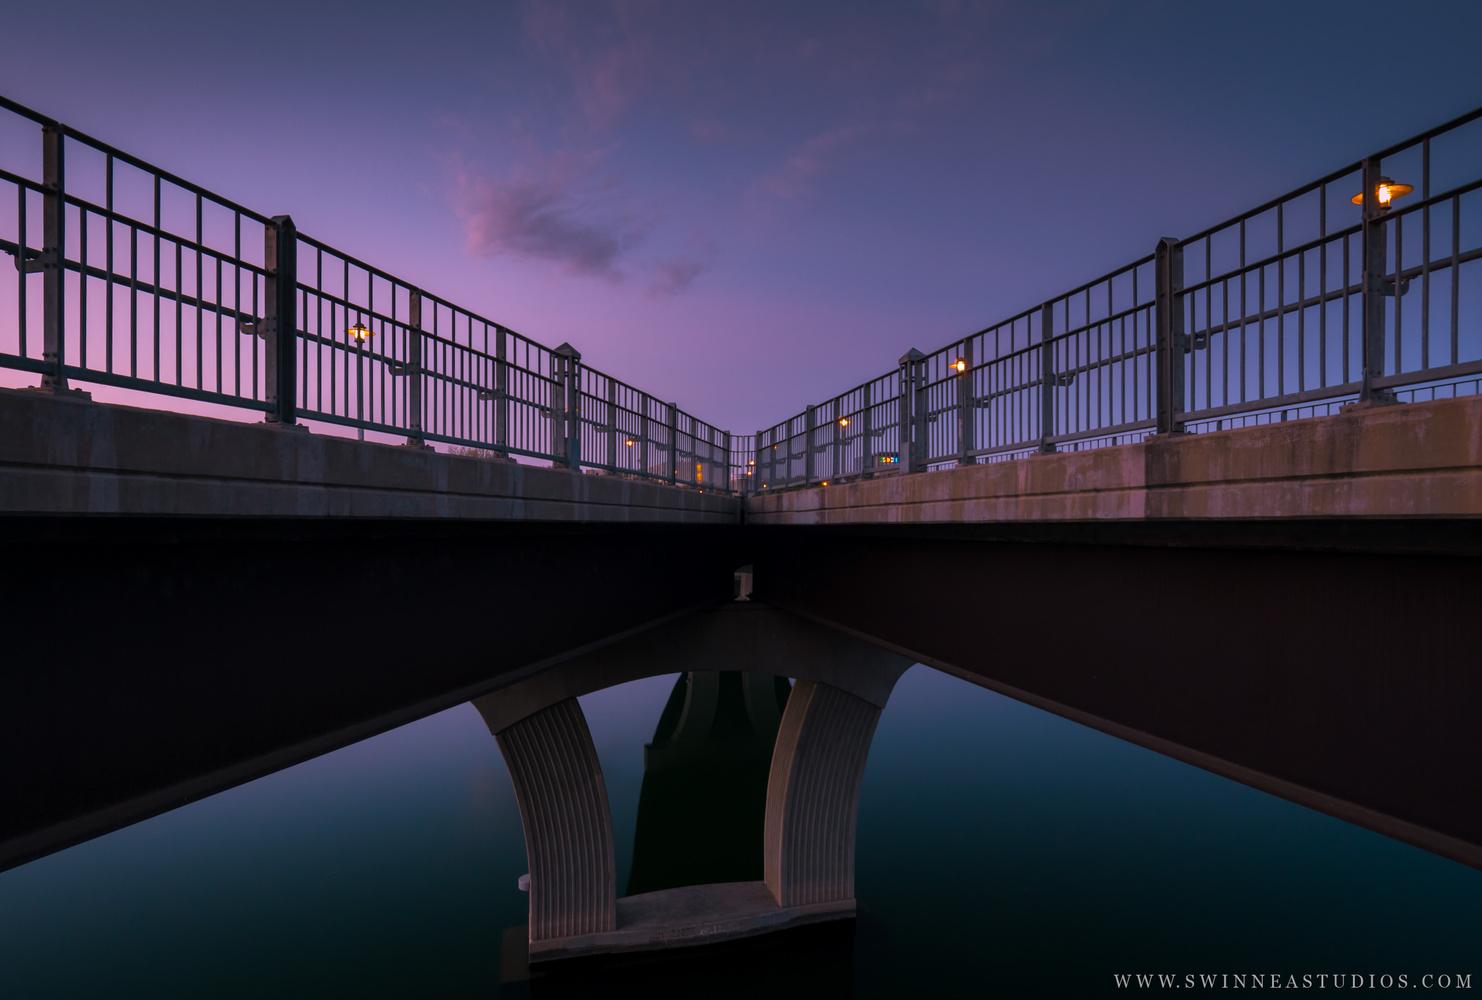 Looking back at the Pfluger Pedestrian bridge at sunrise. by Will Swinnea